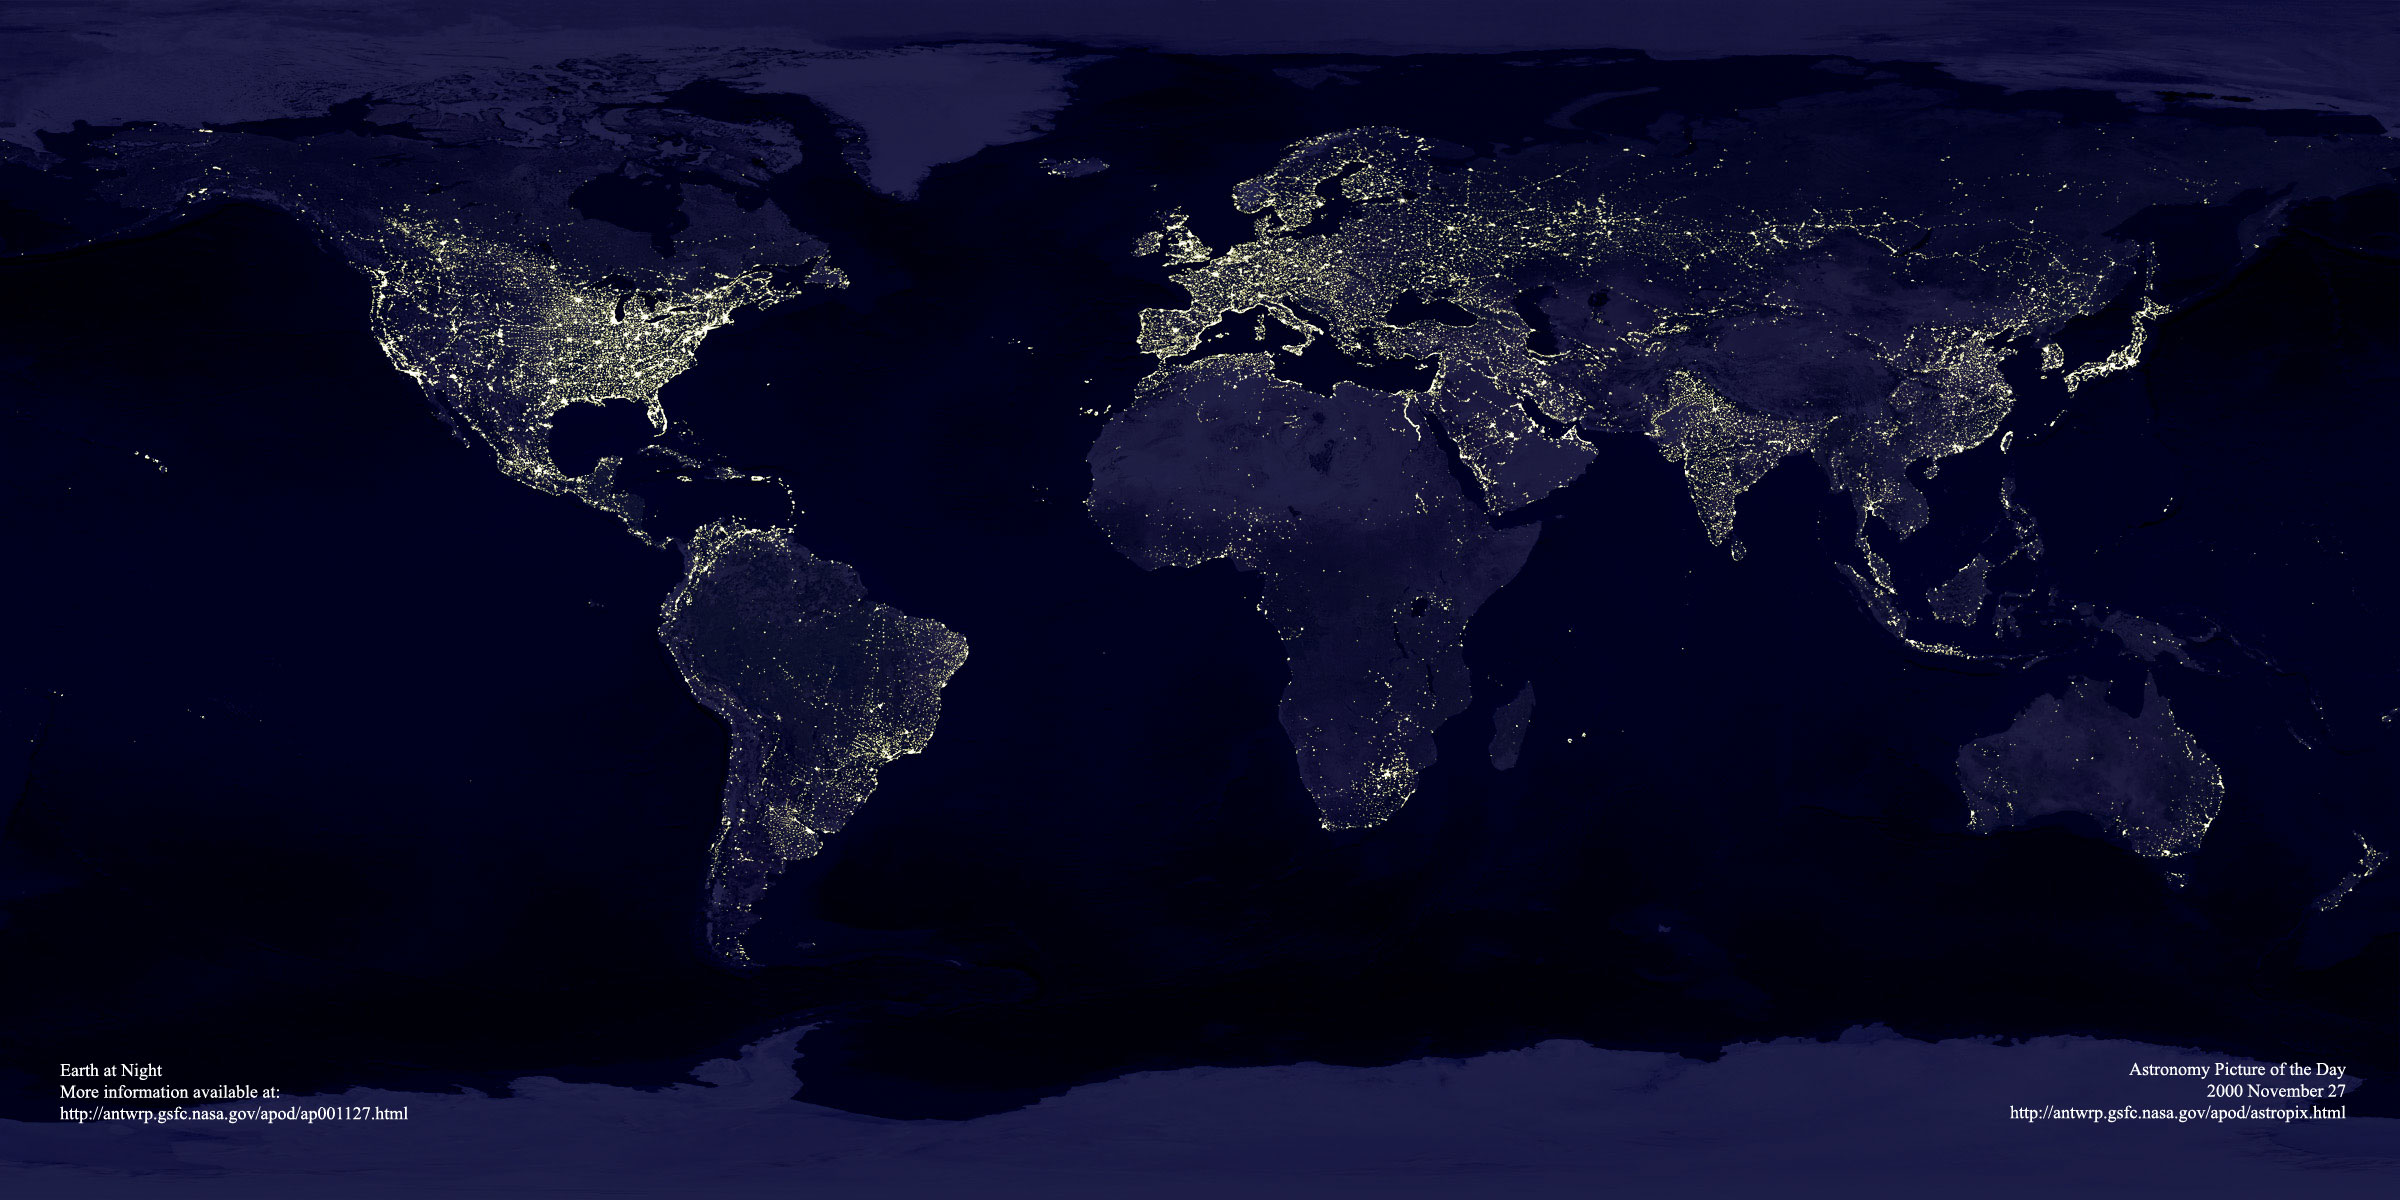 Earth at Night, Nov. 27, 2000. Credit: C. Mayhew & R. Simmon (NASA/GSFC), NOAA/ NGDC, DMSP Digital Archive.